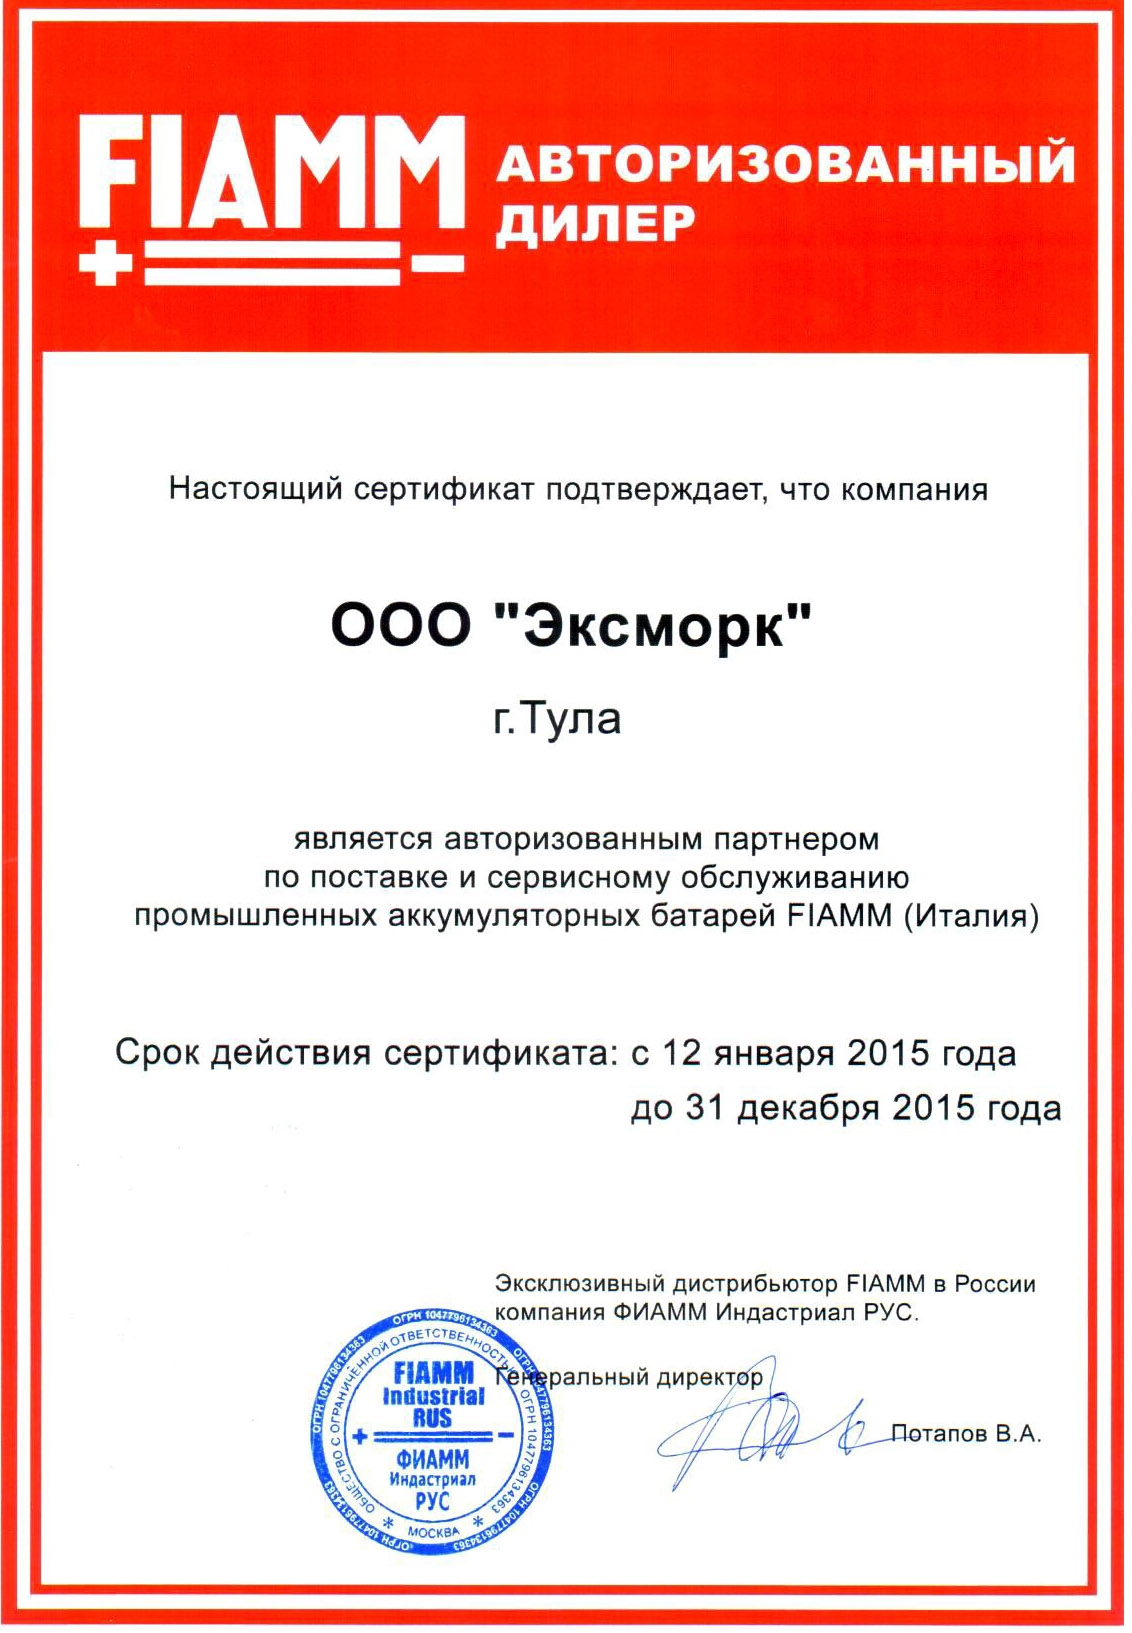 сертификат FIAMM